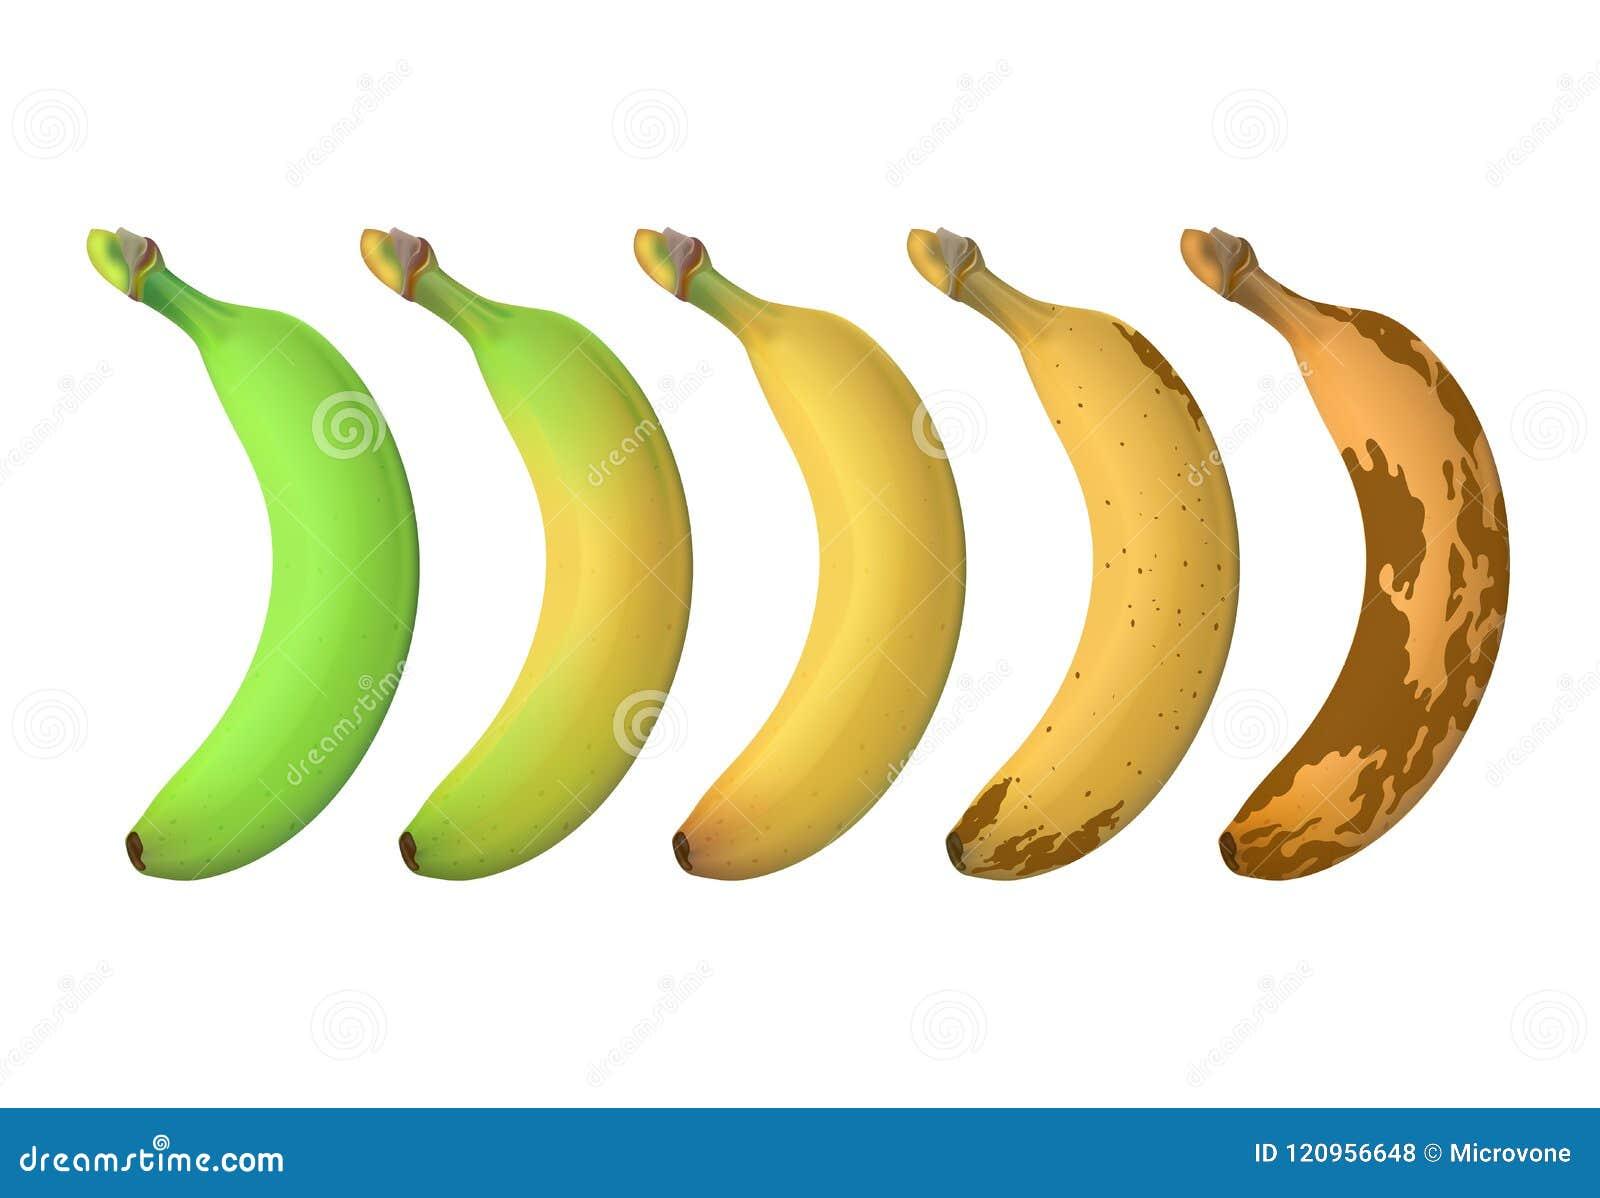 A madureza do fruto da banana nivela de underripe verde para bronzear podre Grupo do vetor isolado no fundo branco